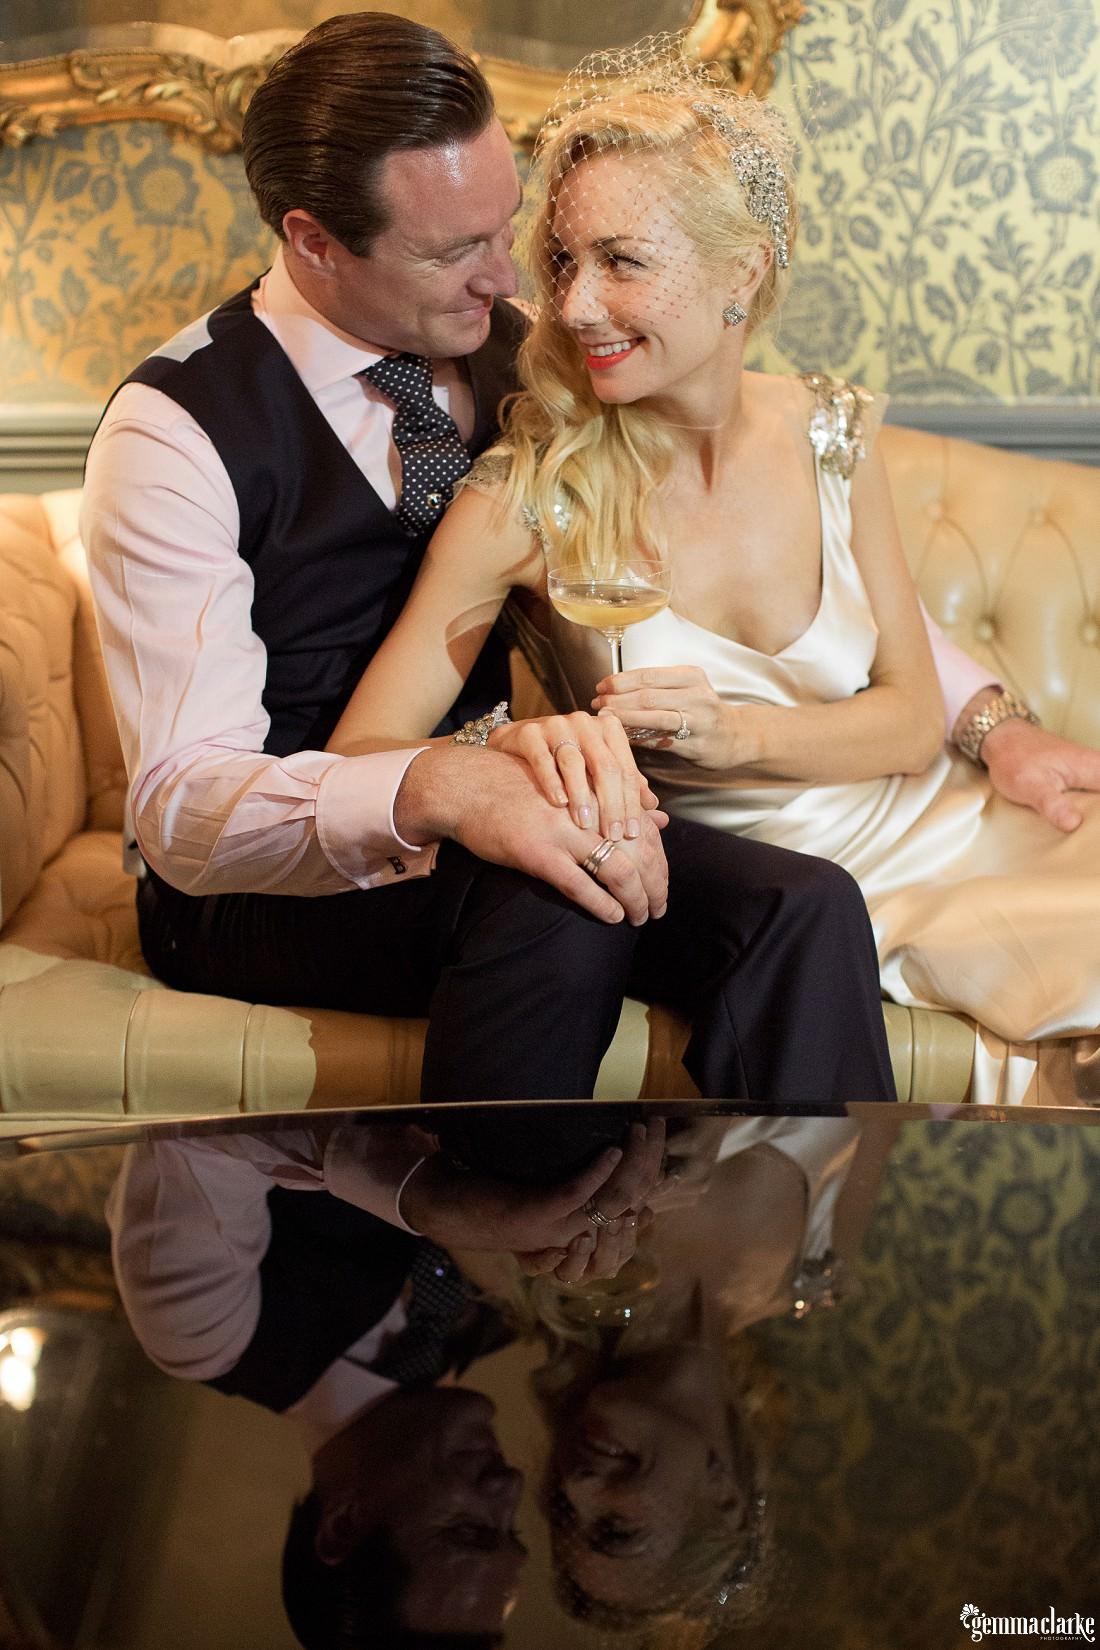 gemma-clarke-photography_watsons-bay-wedding_dog-bridesmaid_kristyl-and-ben_0077